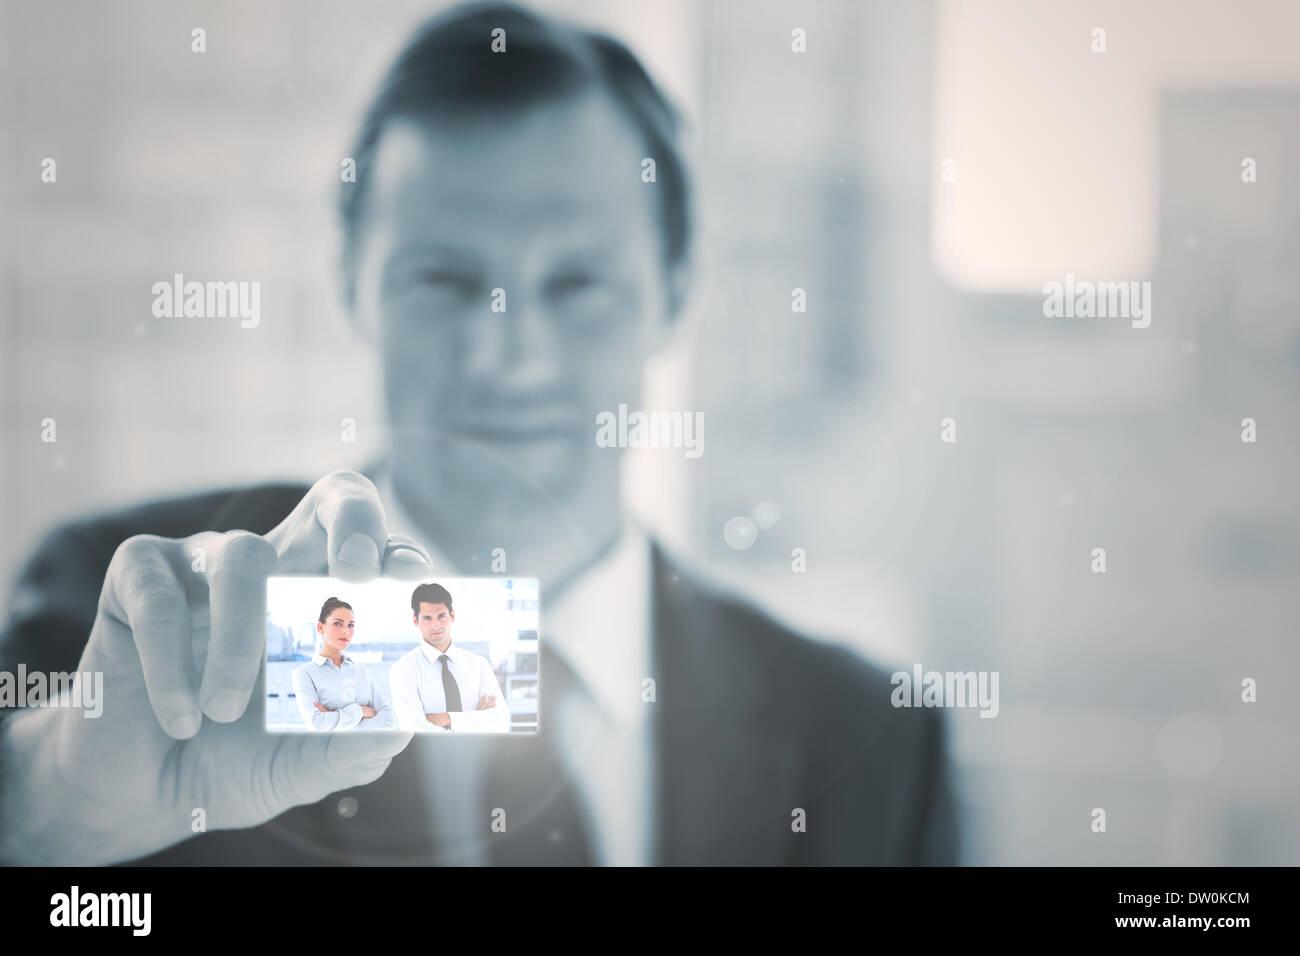 Businessman presenting digital interface Stock Photo